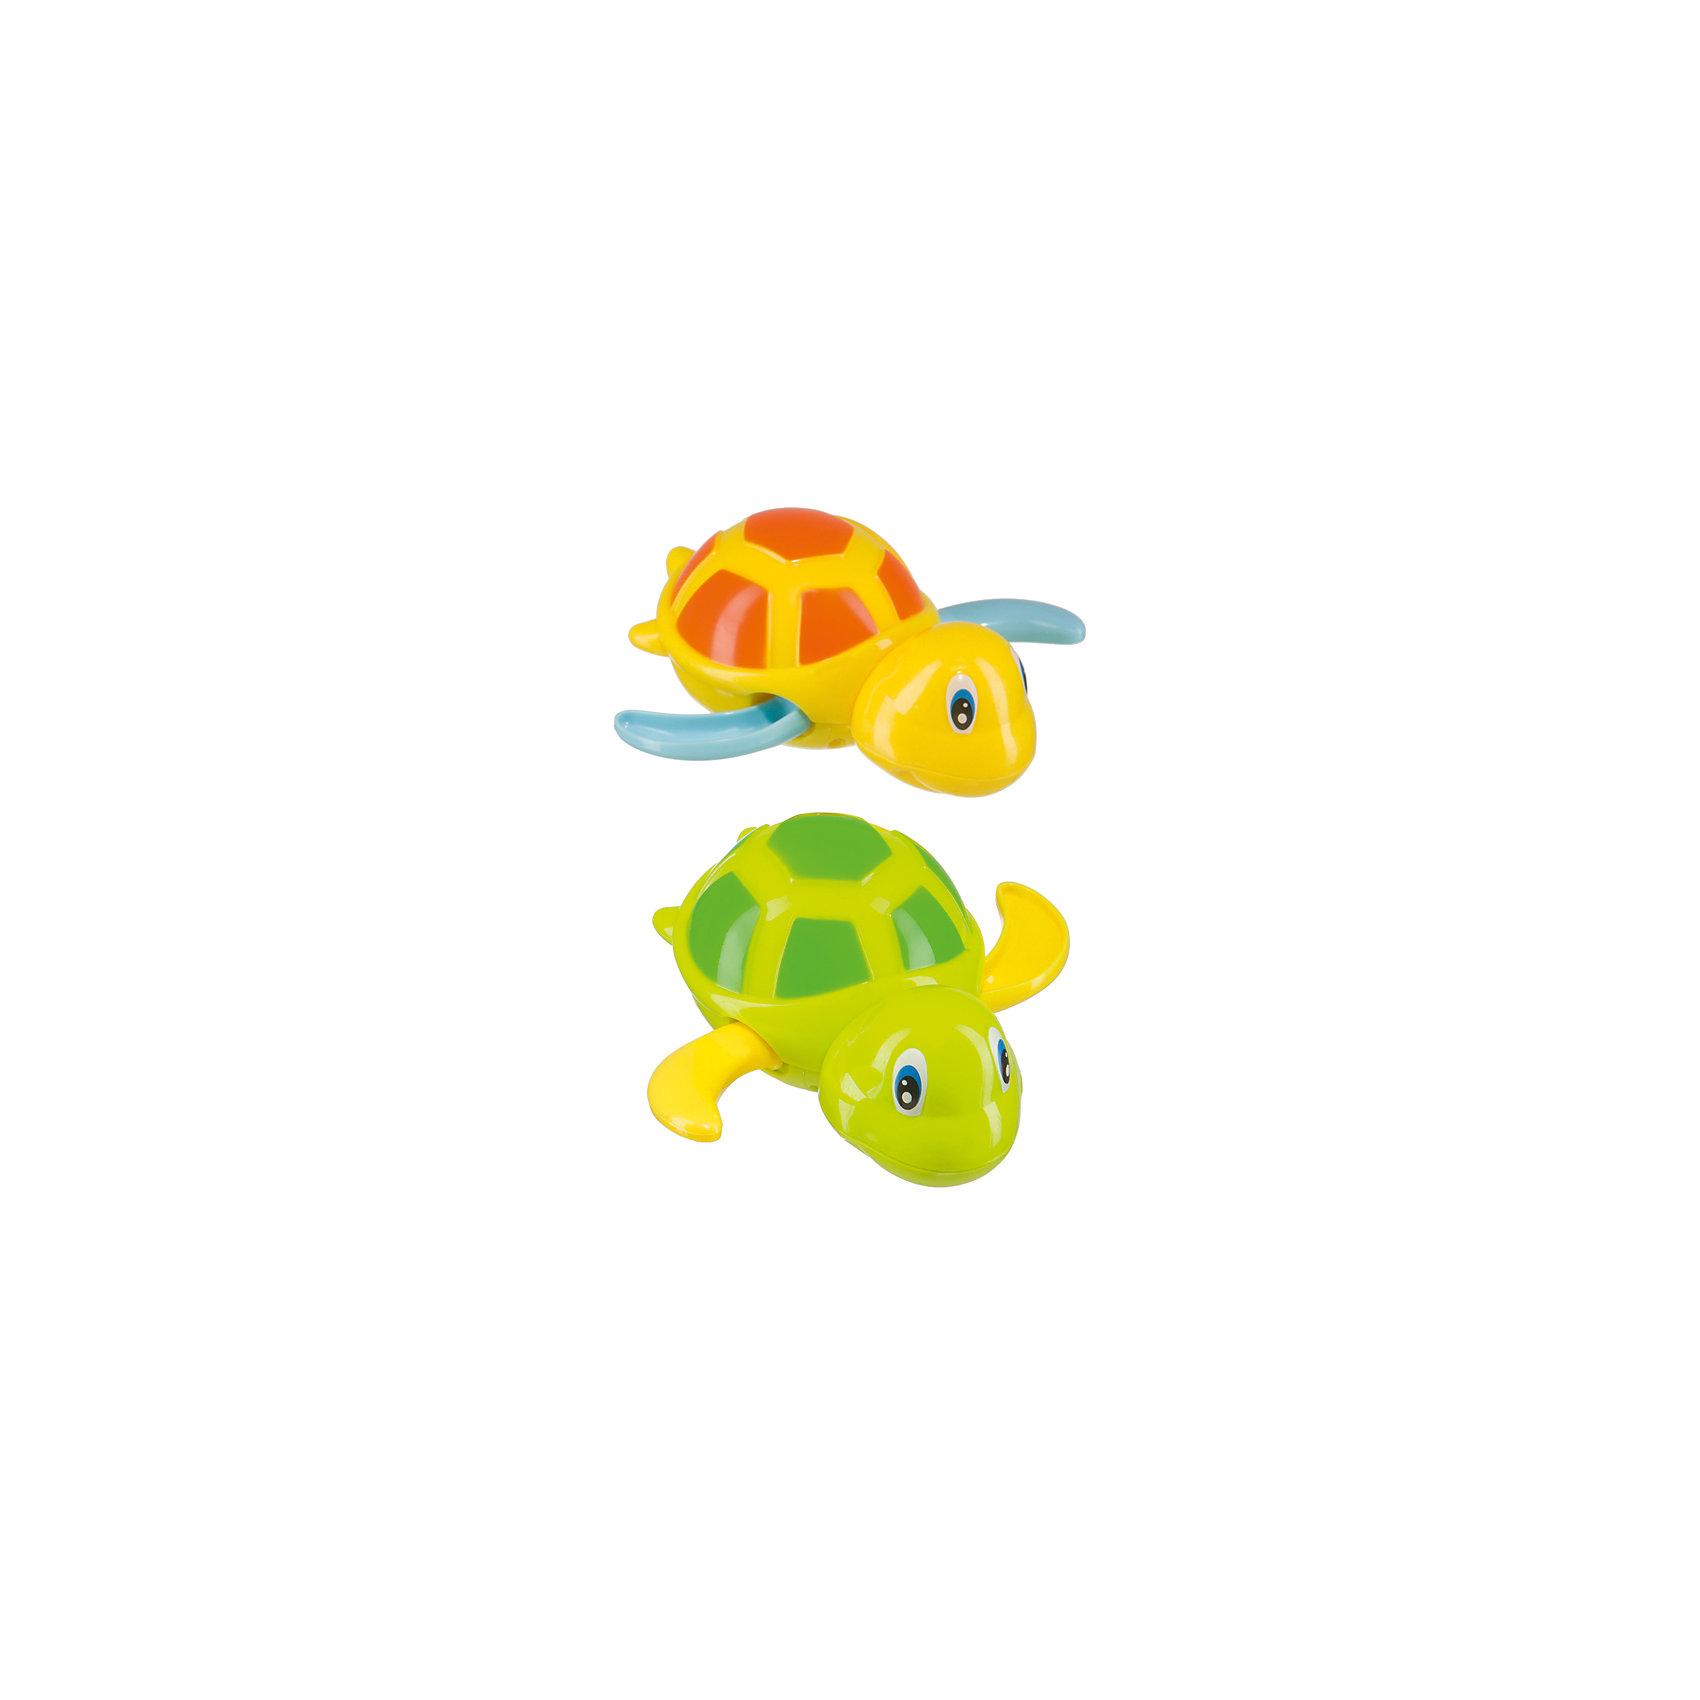 Игрушка SWIMMING TURTLE, Happy BabyДинамические игрушки<br><br><br>Ширина мм: 9999<br>Глубина мм: 9999<br>Высота мм: 9999<br>Вес г: 9999<br>Возраст от месяцев: 3<br>Возраст до месяцев: 36<br>Пол: Унисекс<br>Возраст: Детский<br>SKU: 5345706